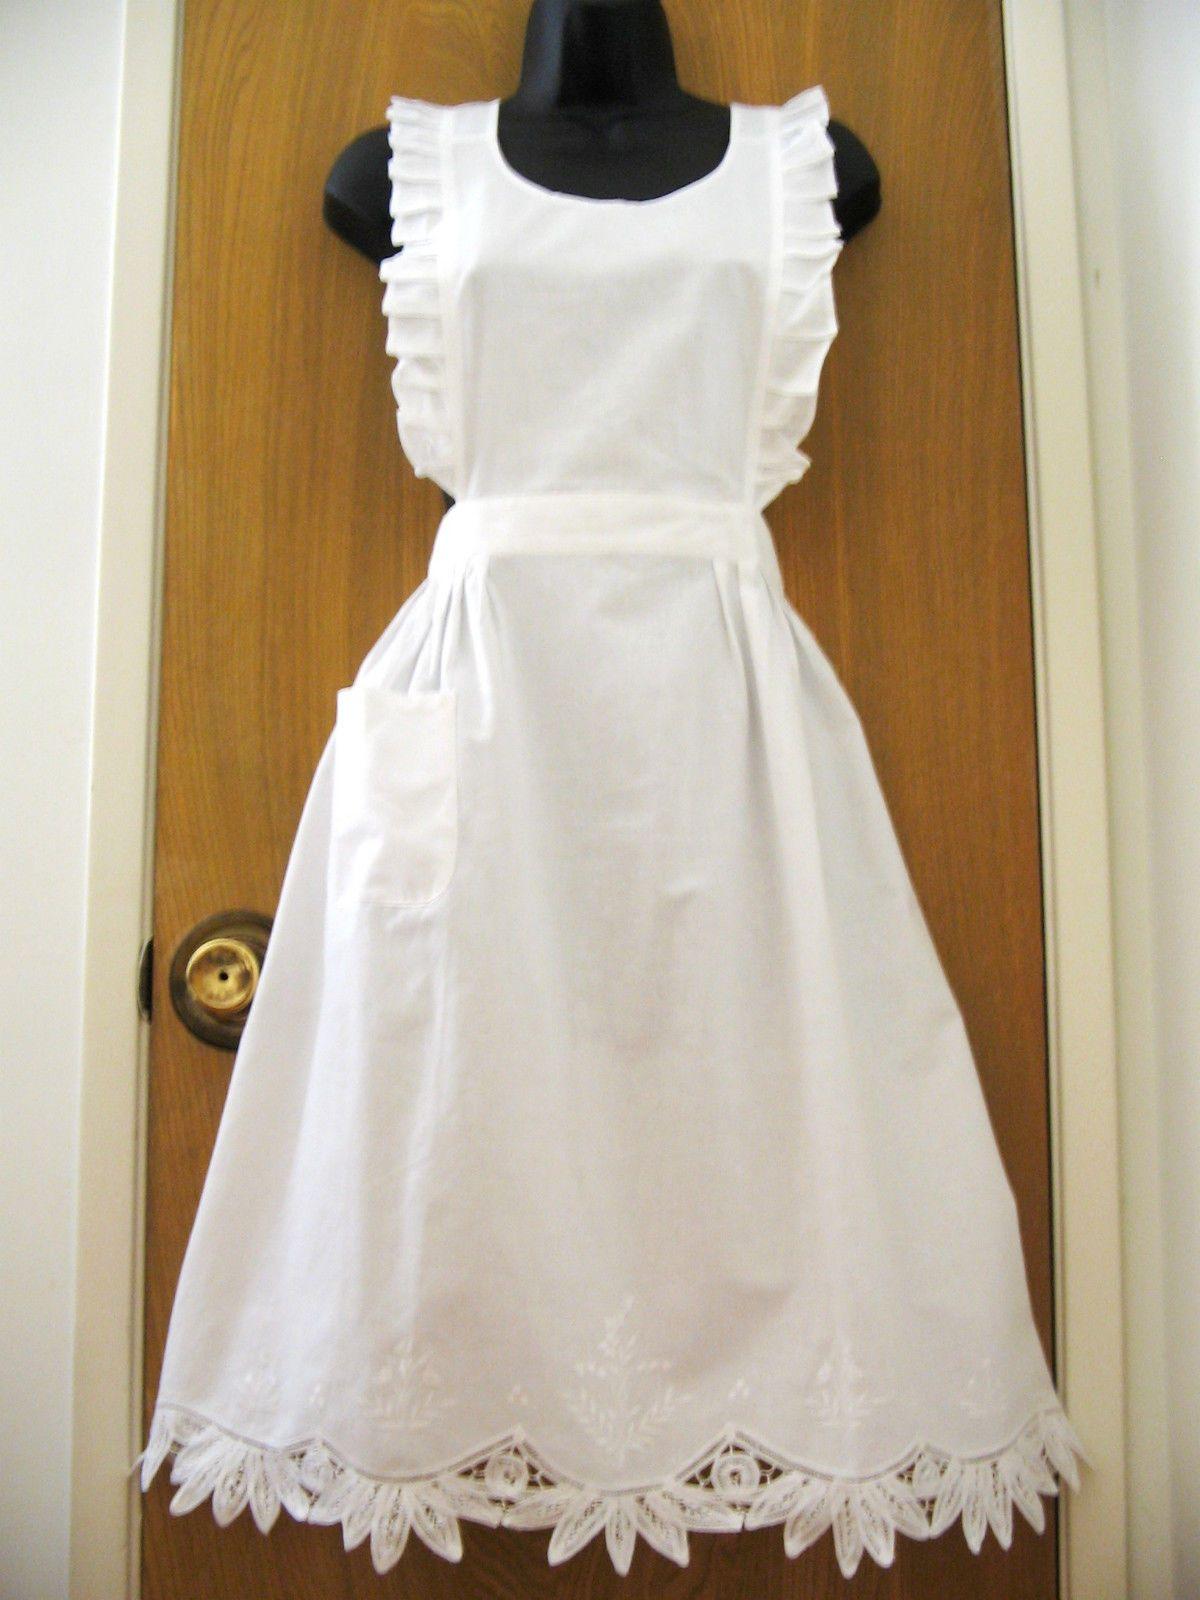 White pinafore apron costume - New Victorian White Battenburg Lace Bib Apron Pinafore Cinderella Play Costume